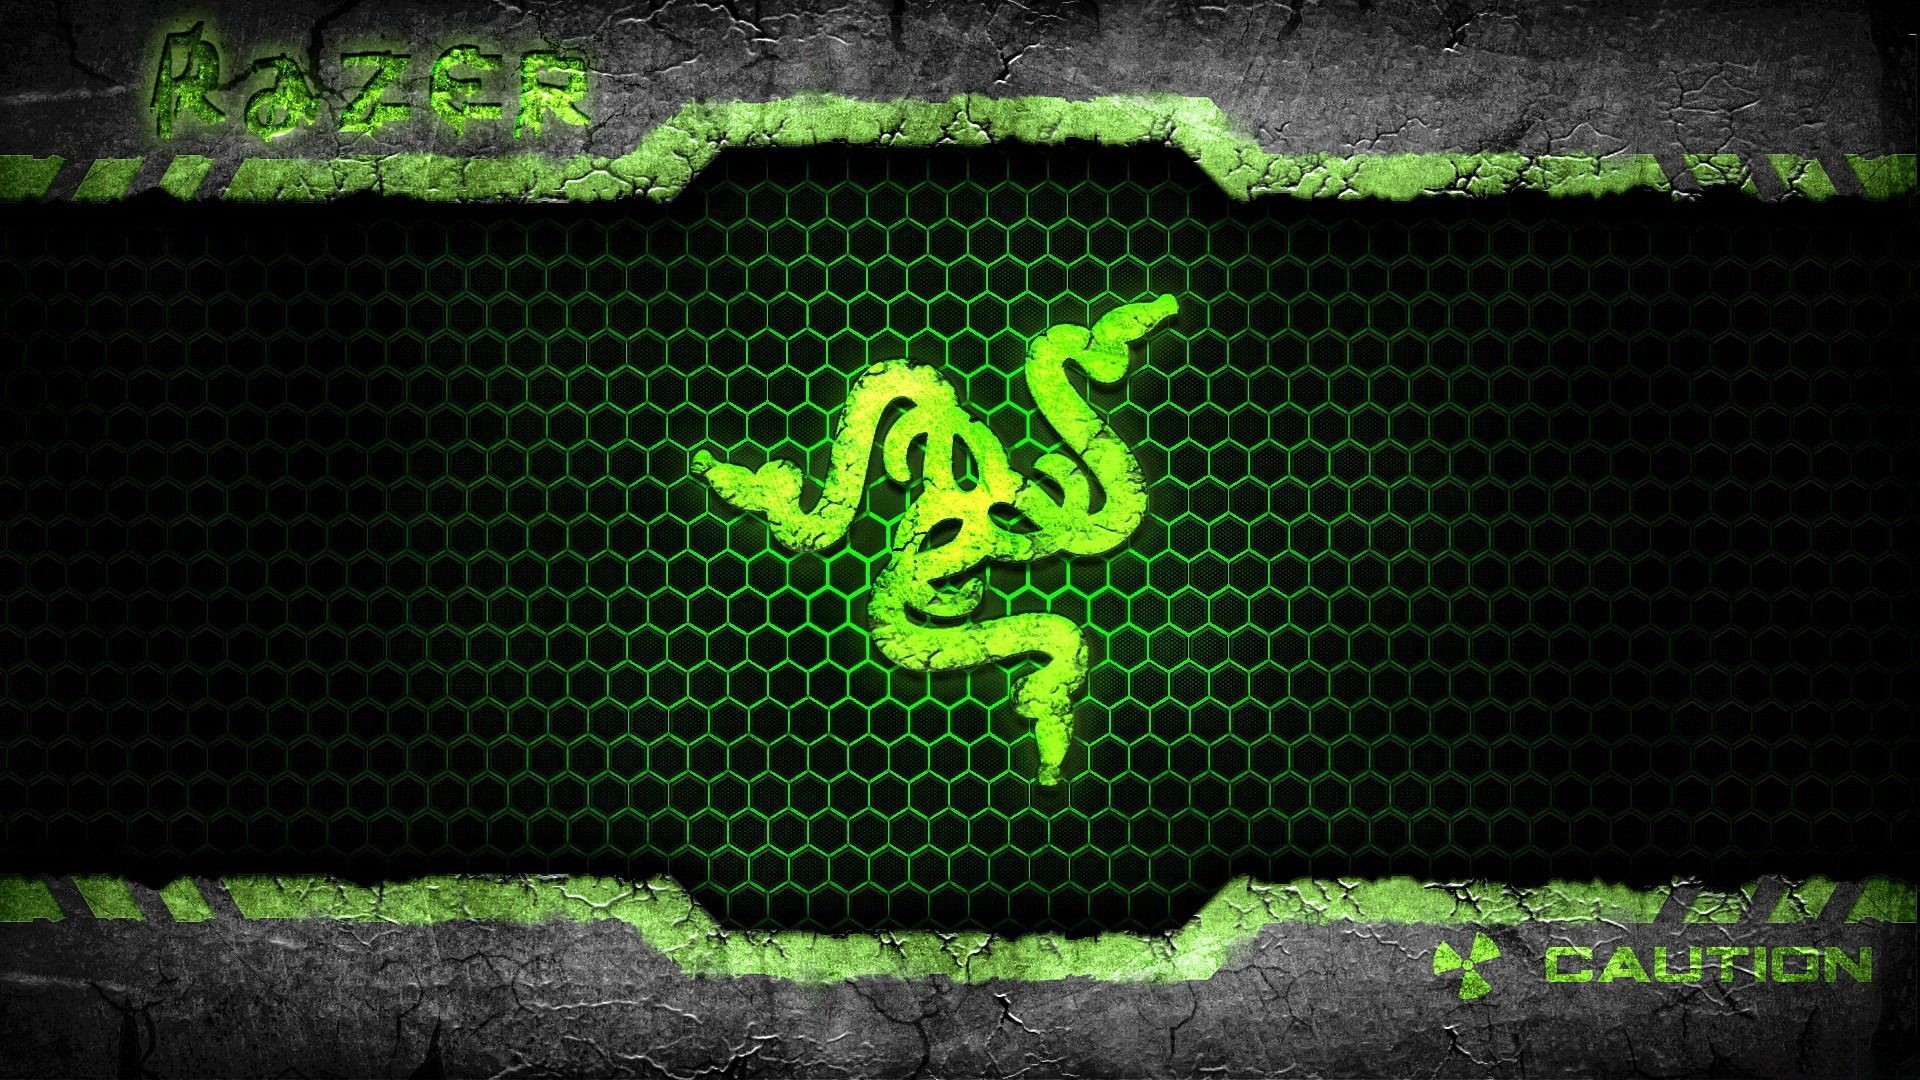 Razer Desktop Backgrounds – Wallpaper Cave